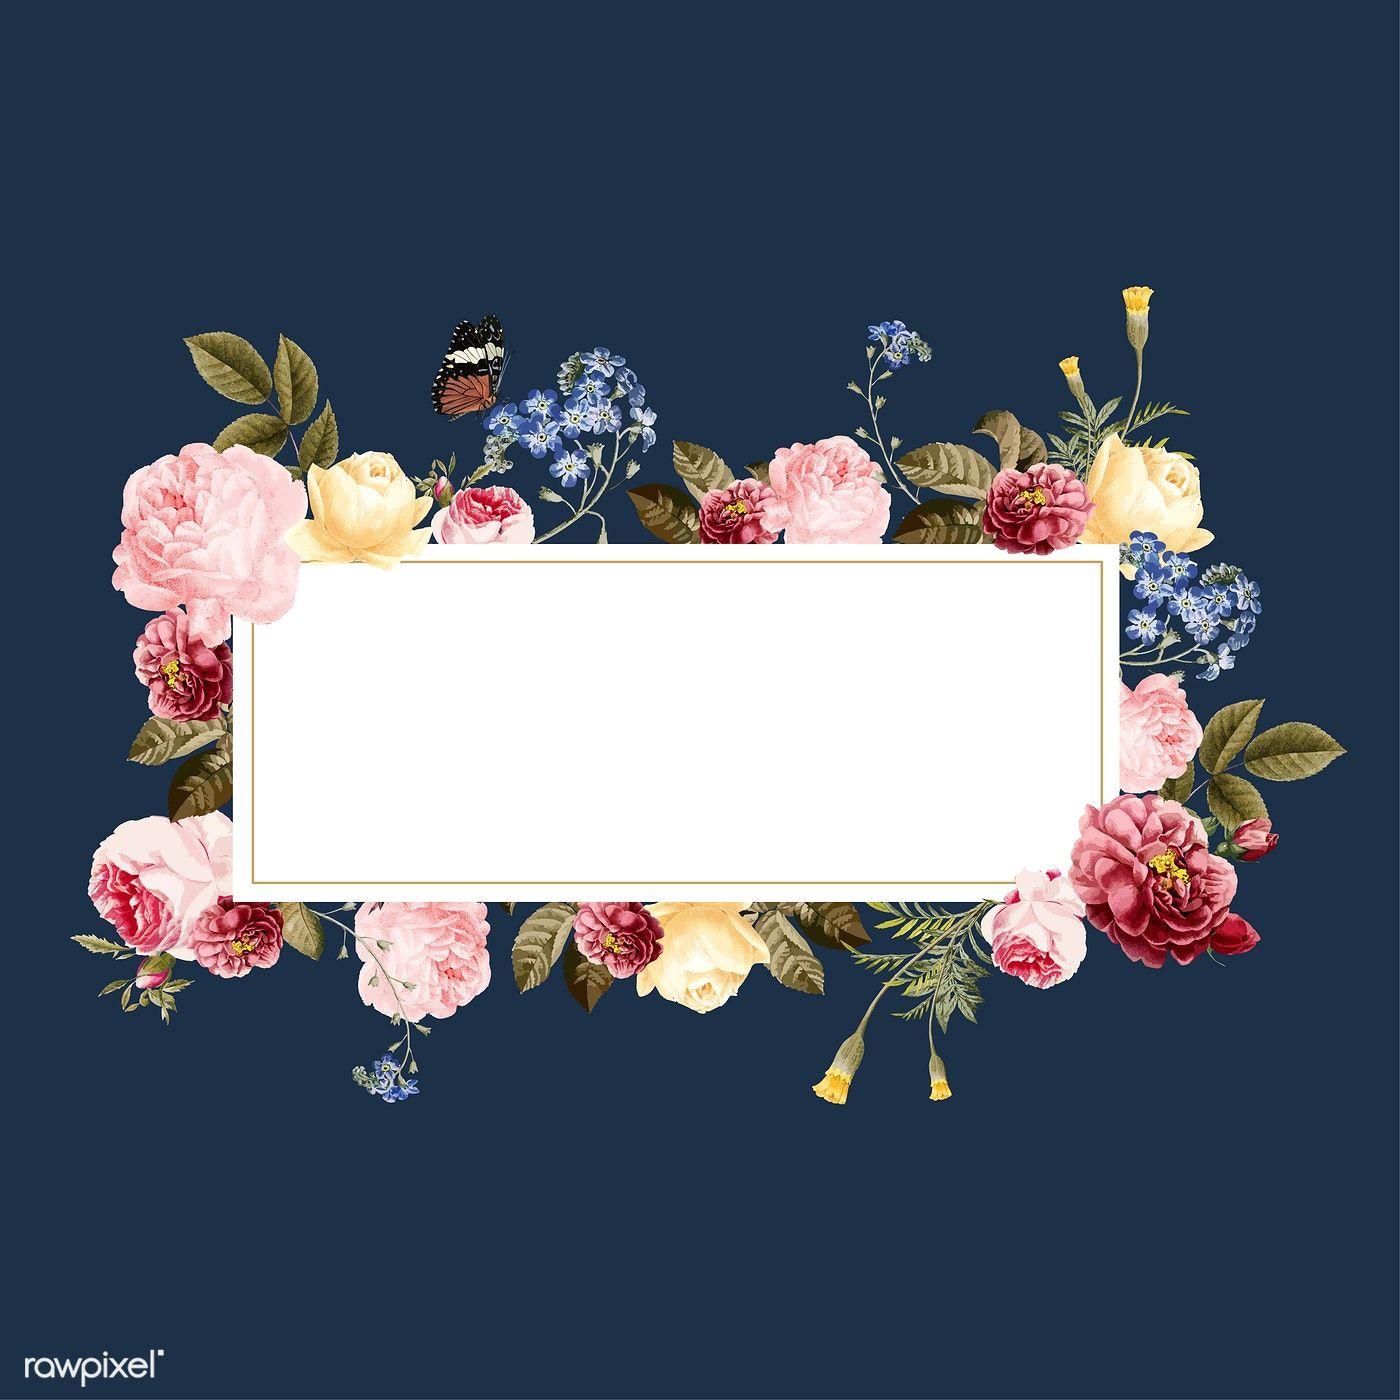 Download Premium Vector Of Blank Floral Frame Card Illustration 471735 Card Illustration Frame Card Floral Poster